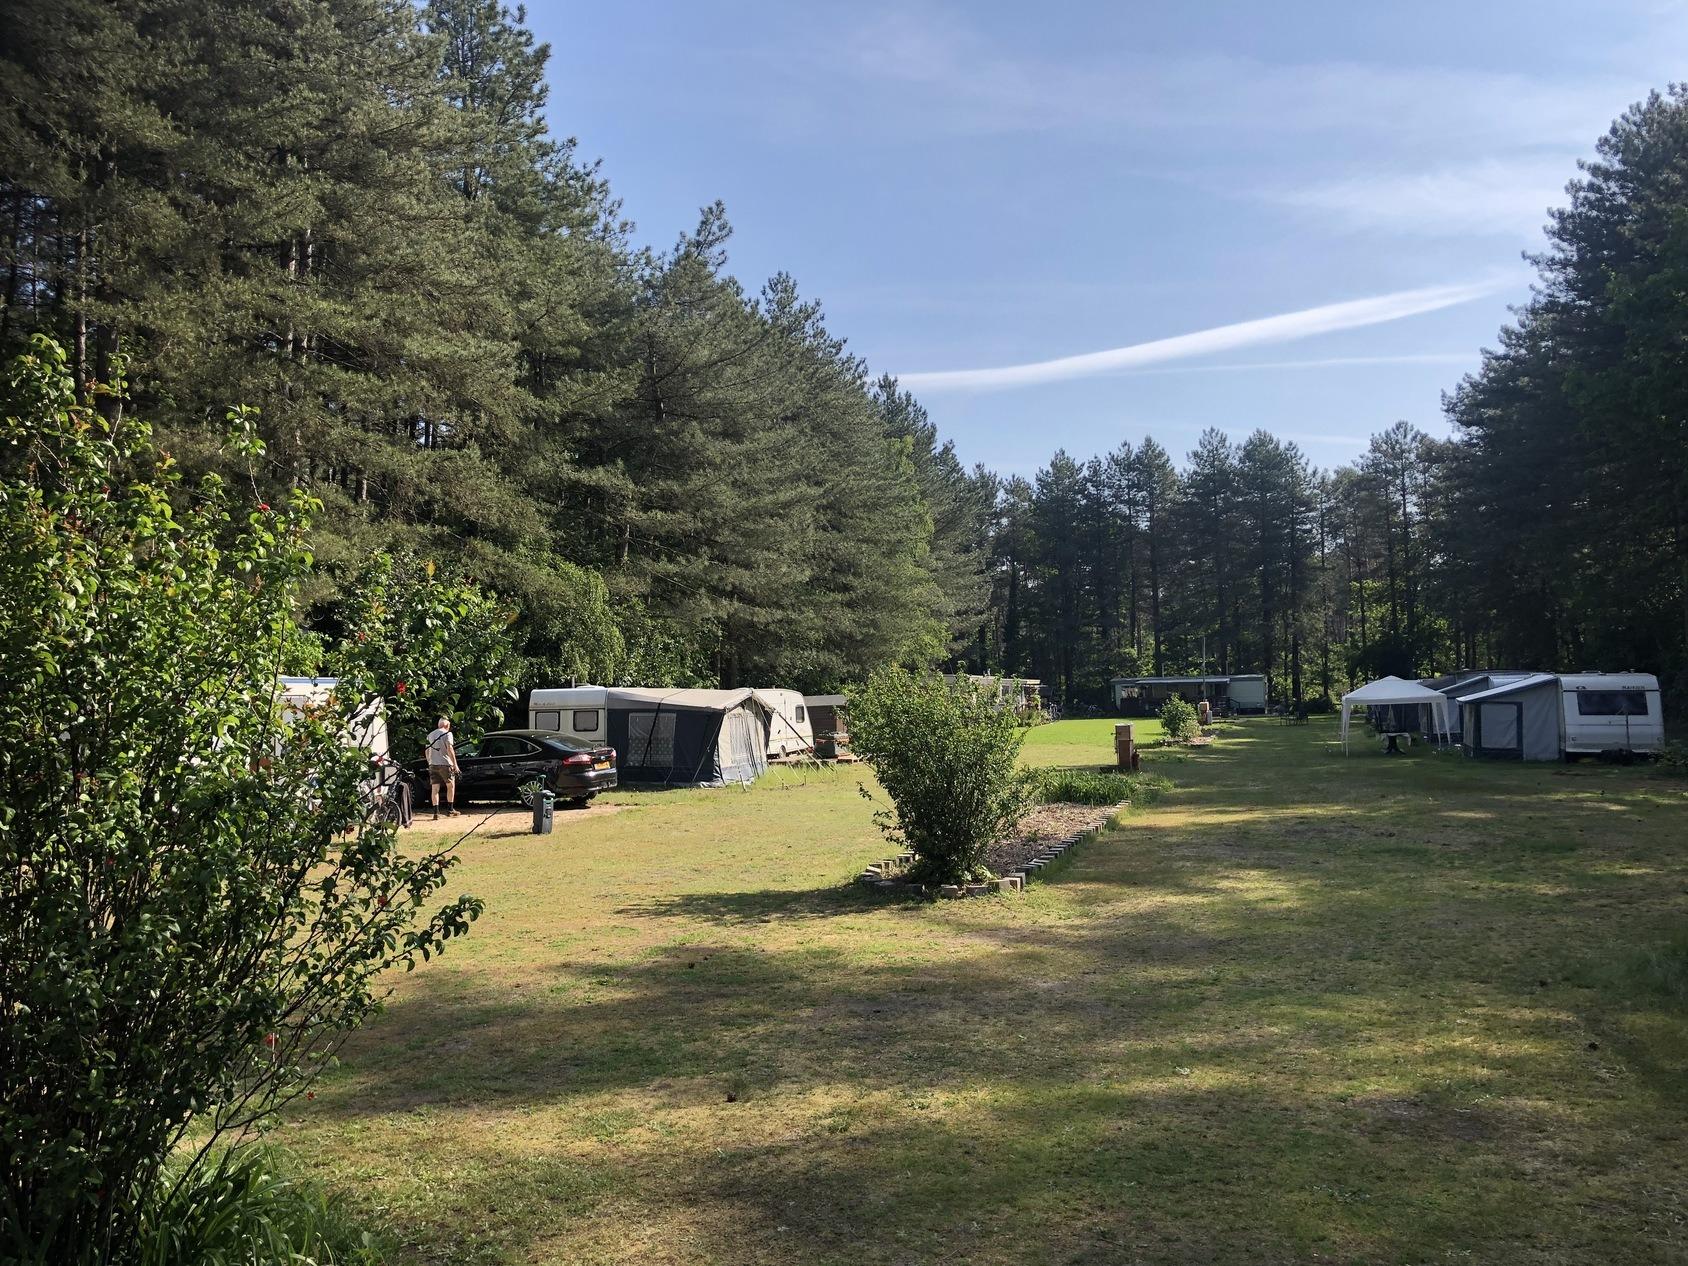 Caravanpark Siesta